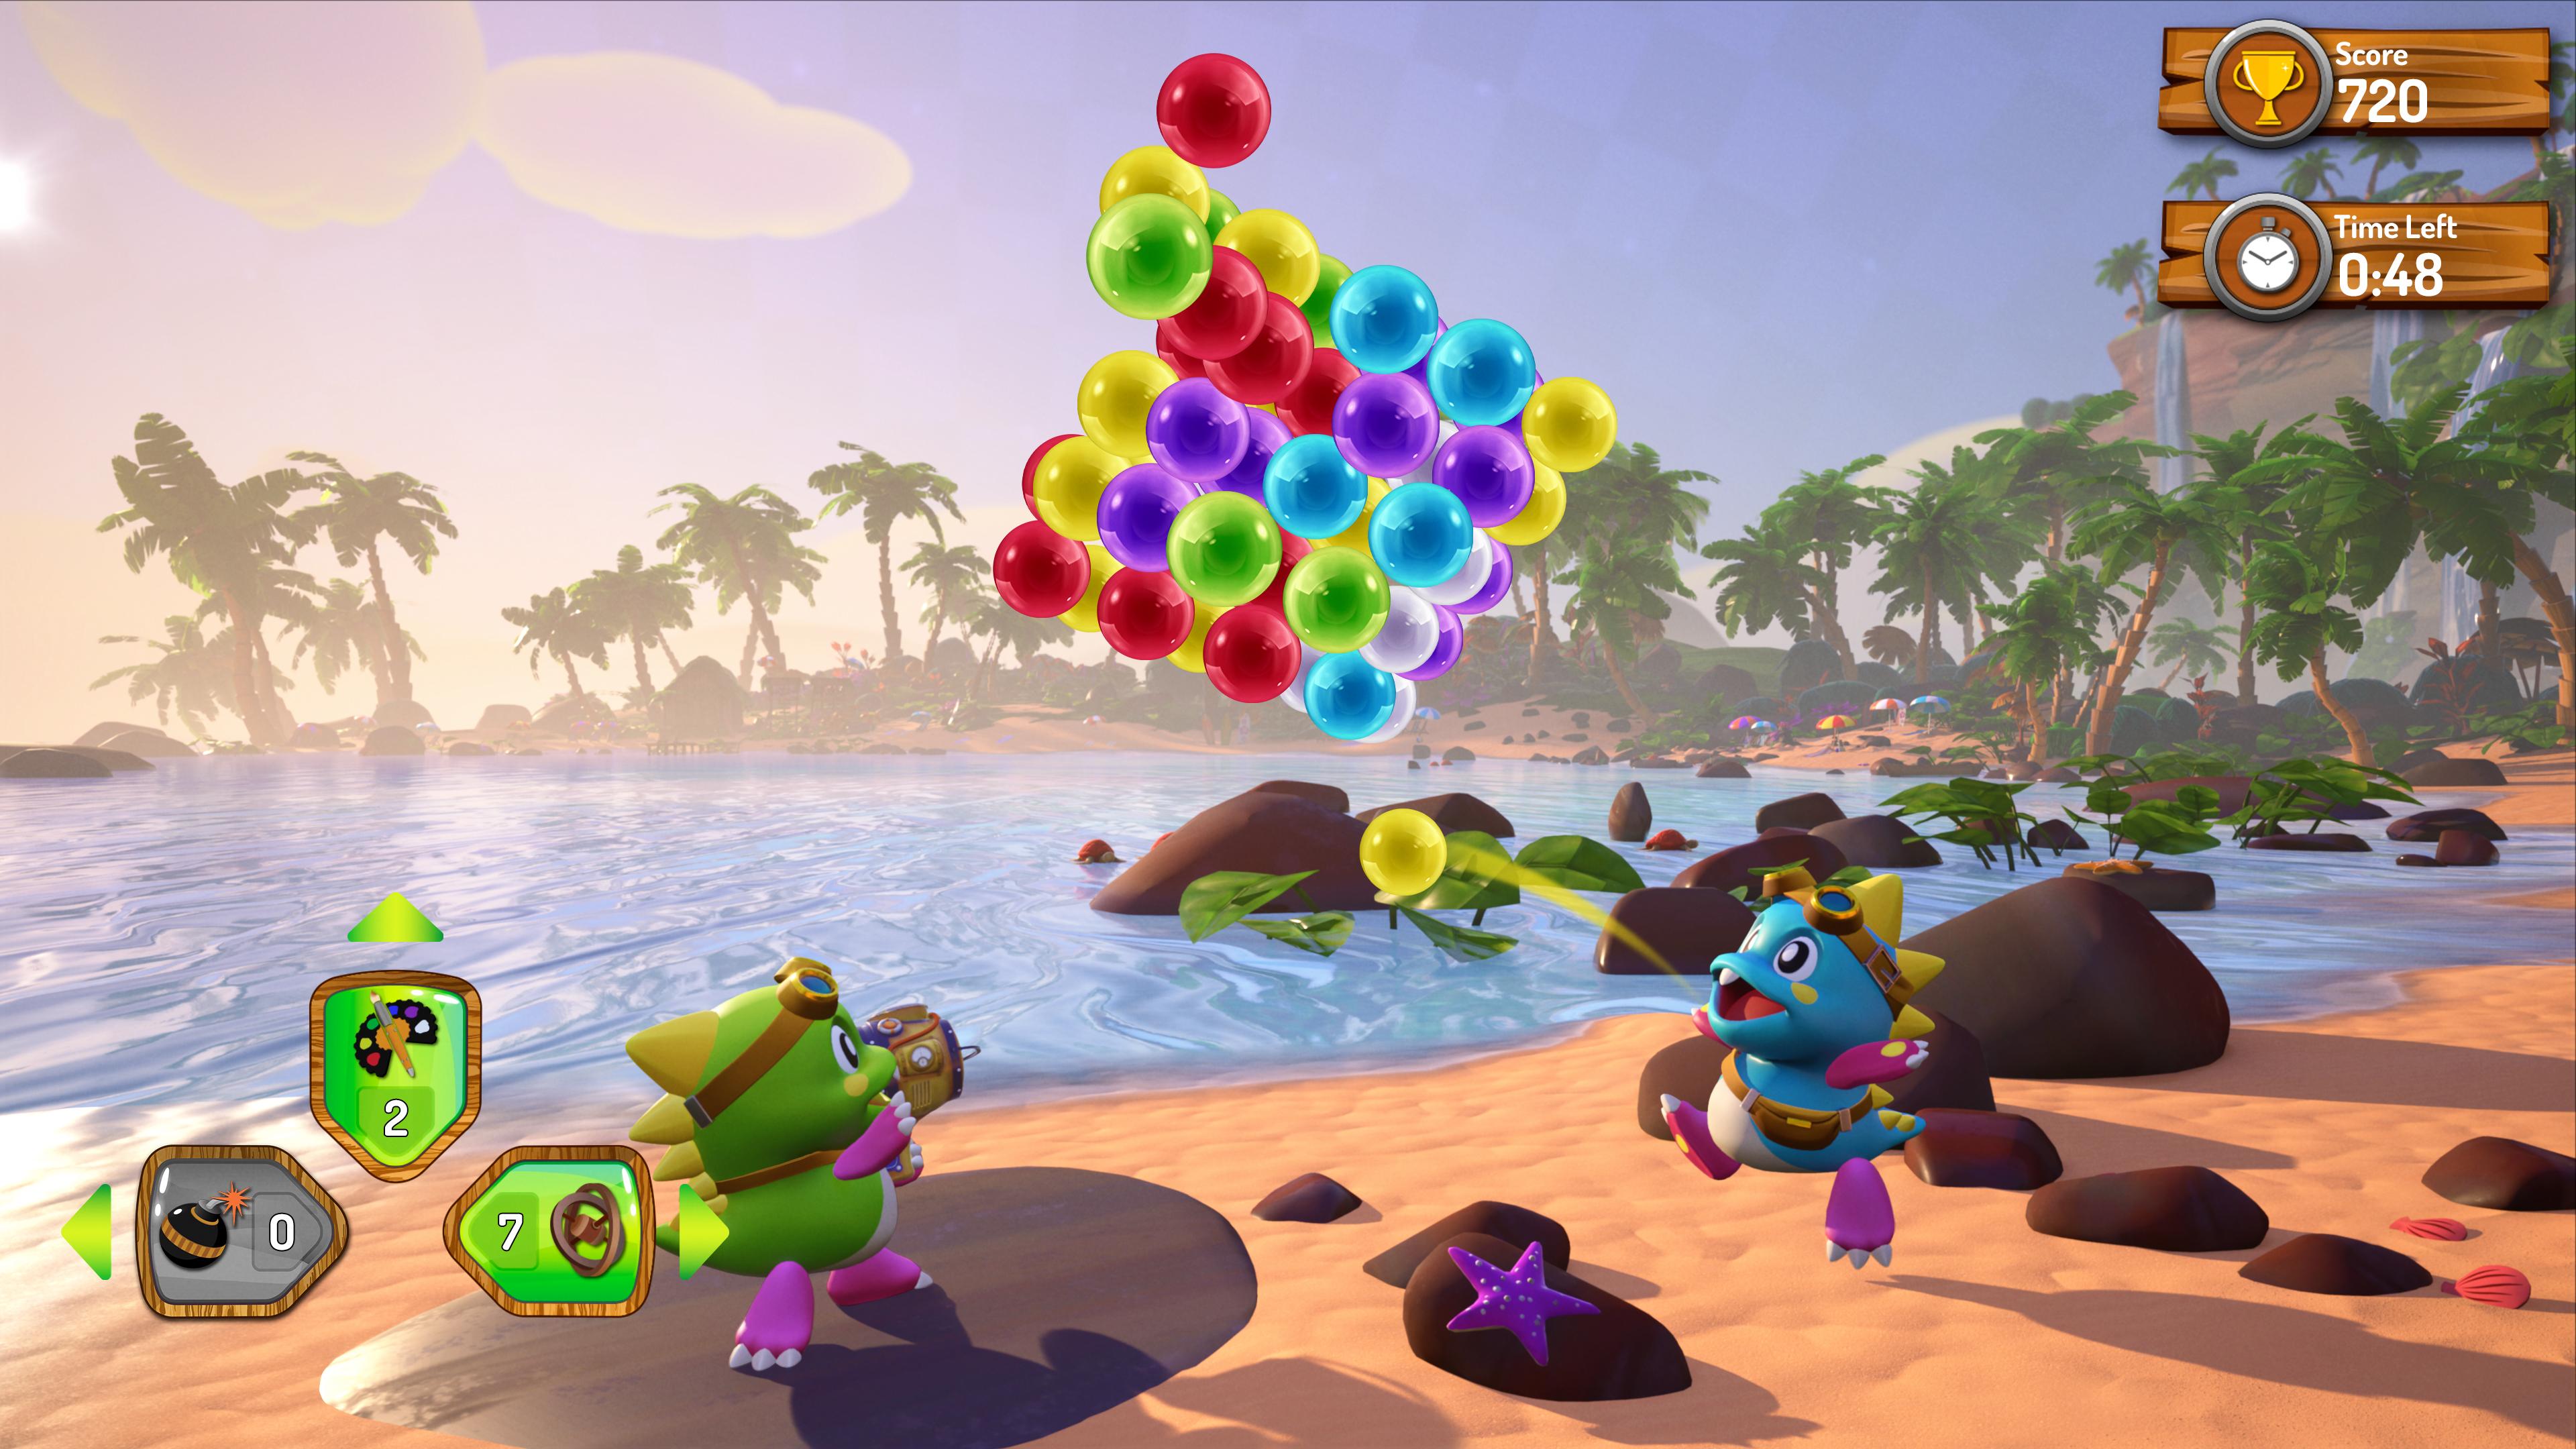 Скриншот №2 к Puzzle Bobble 3D Vacation Odyssey